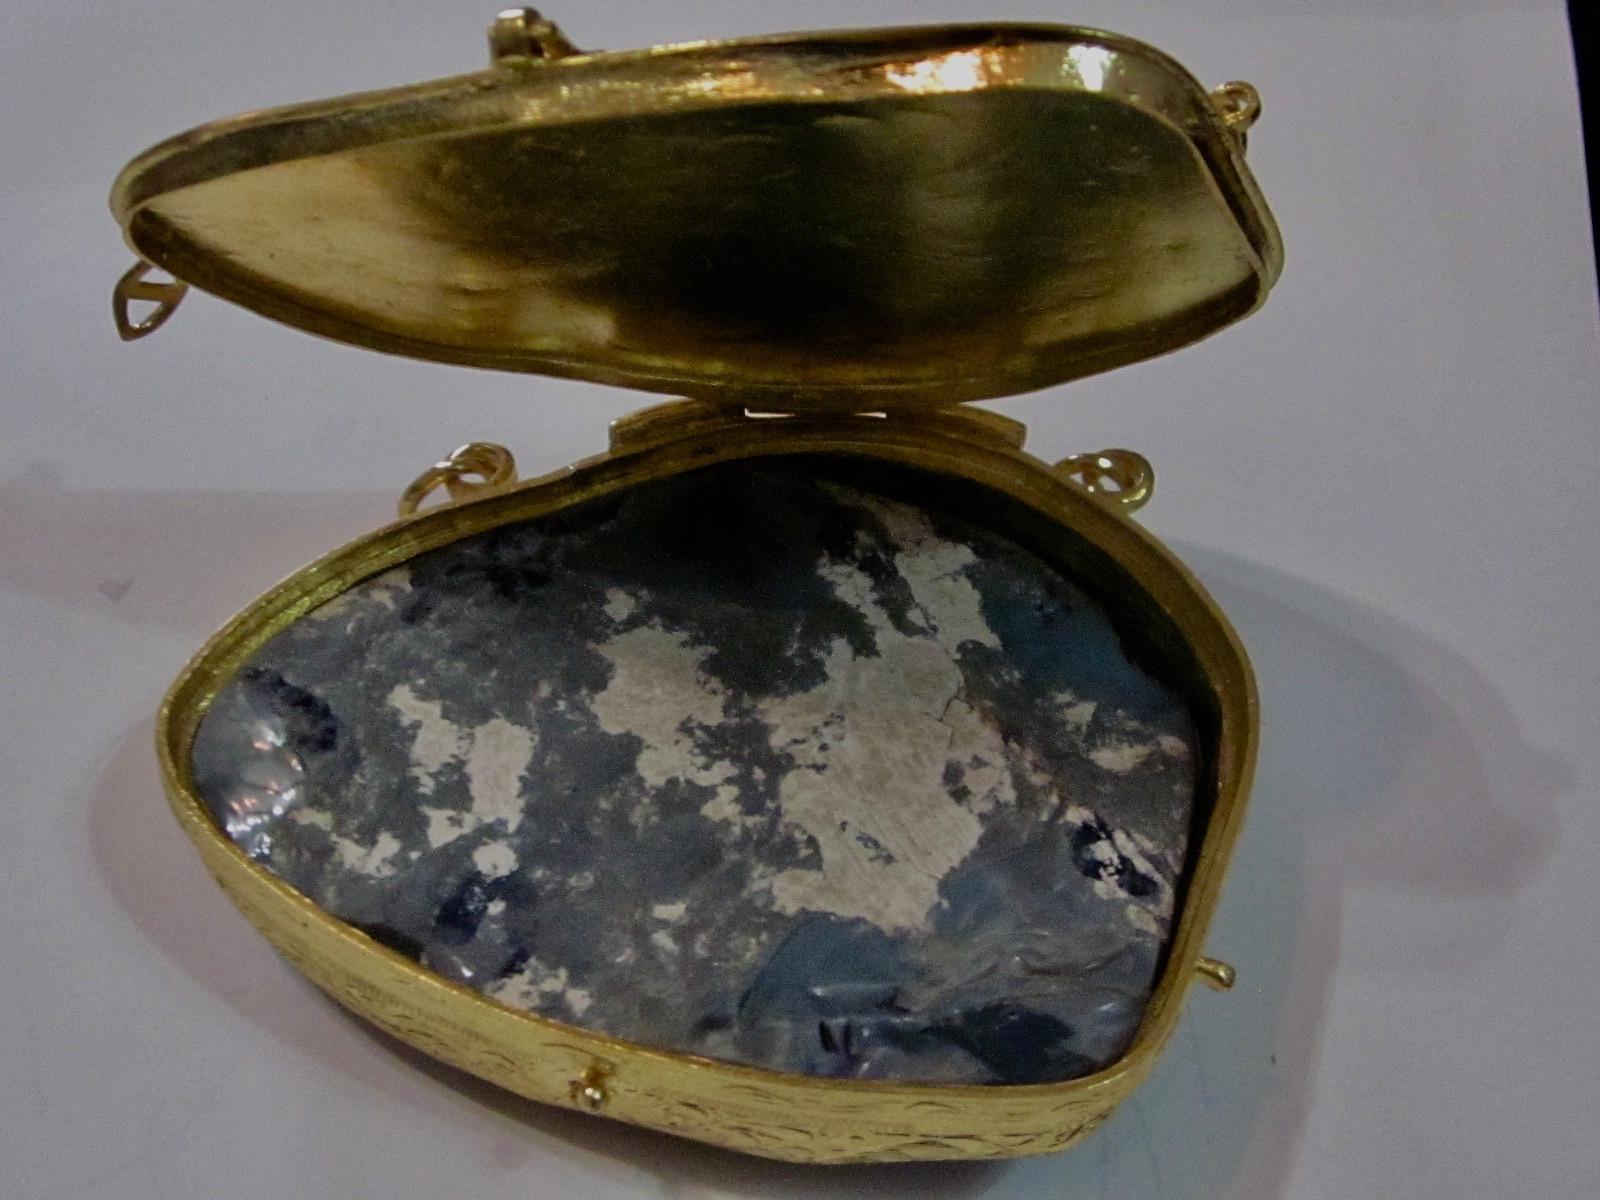 opal collector item,opal gemstone